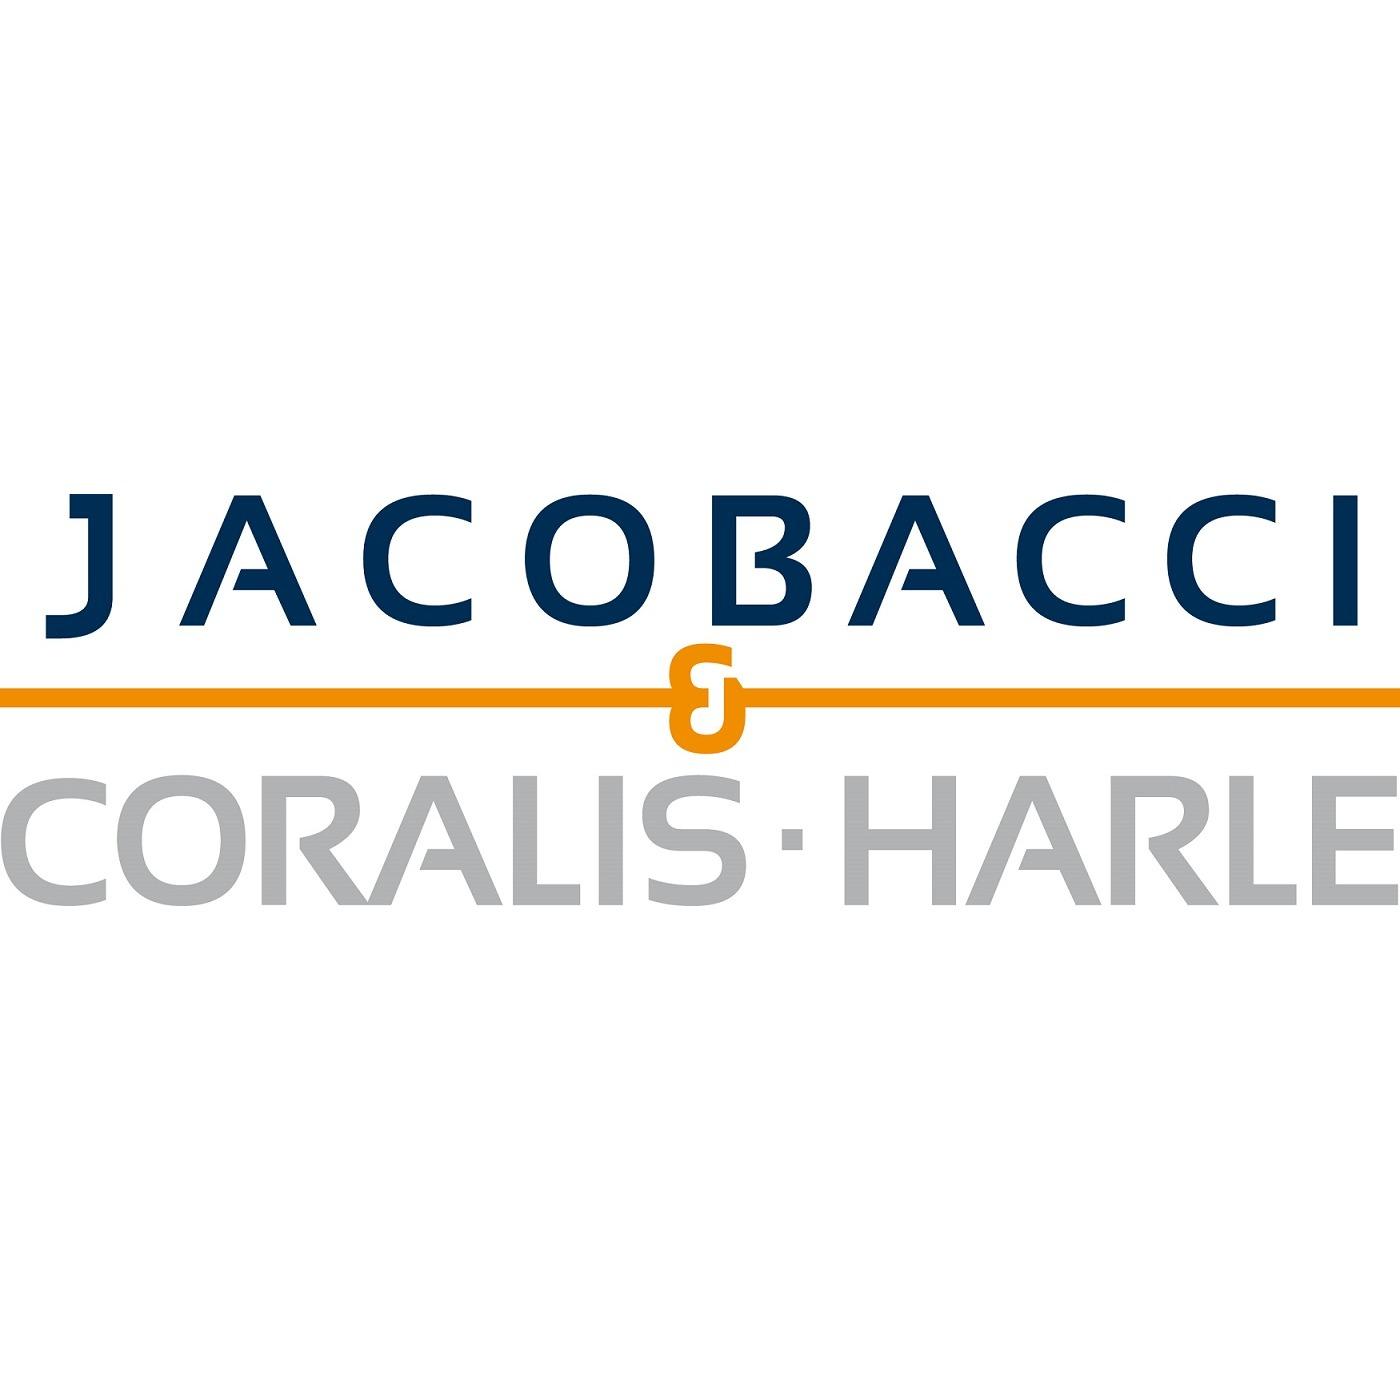 the Jacobacci Coralis Harle logo.